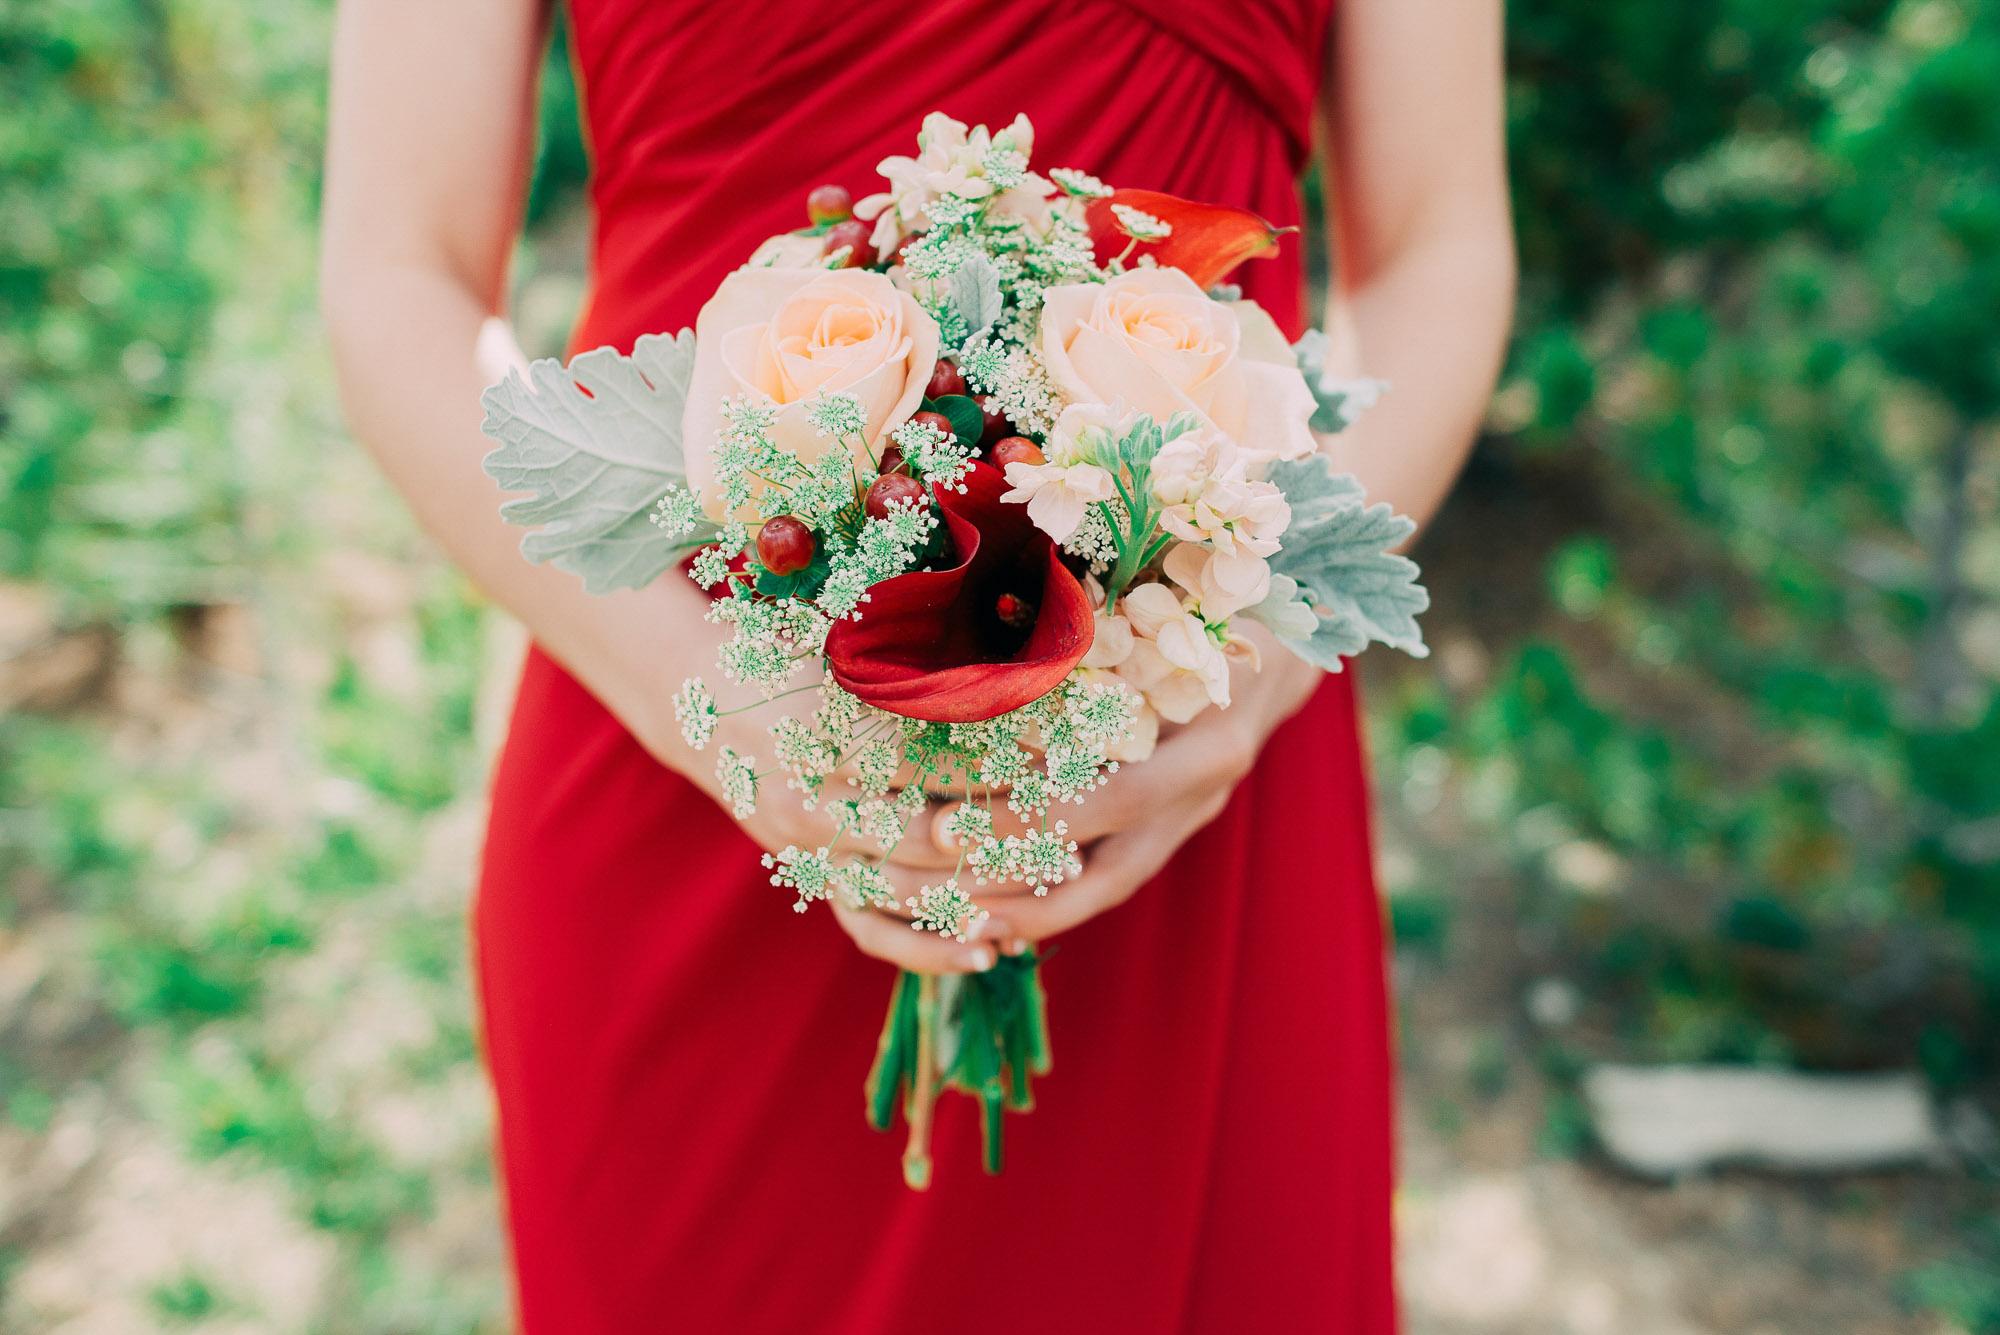 88elopement-photographer-colorado-049snow_mountain_ranch_wedding_colorado_wedding_photographer_kara&jason_0469_vintage_film.jpg